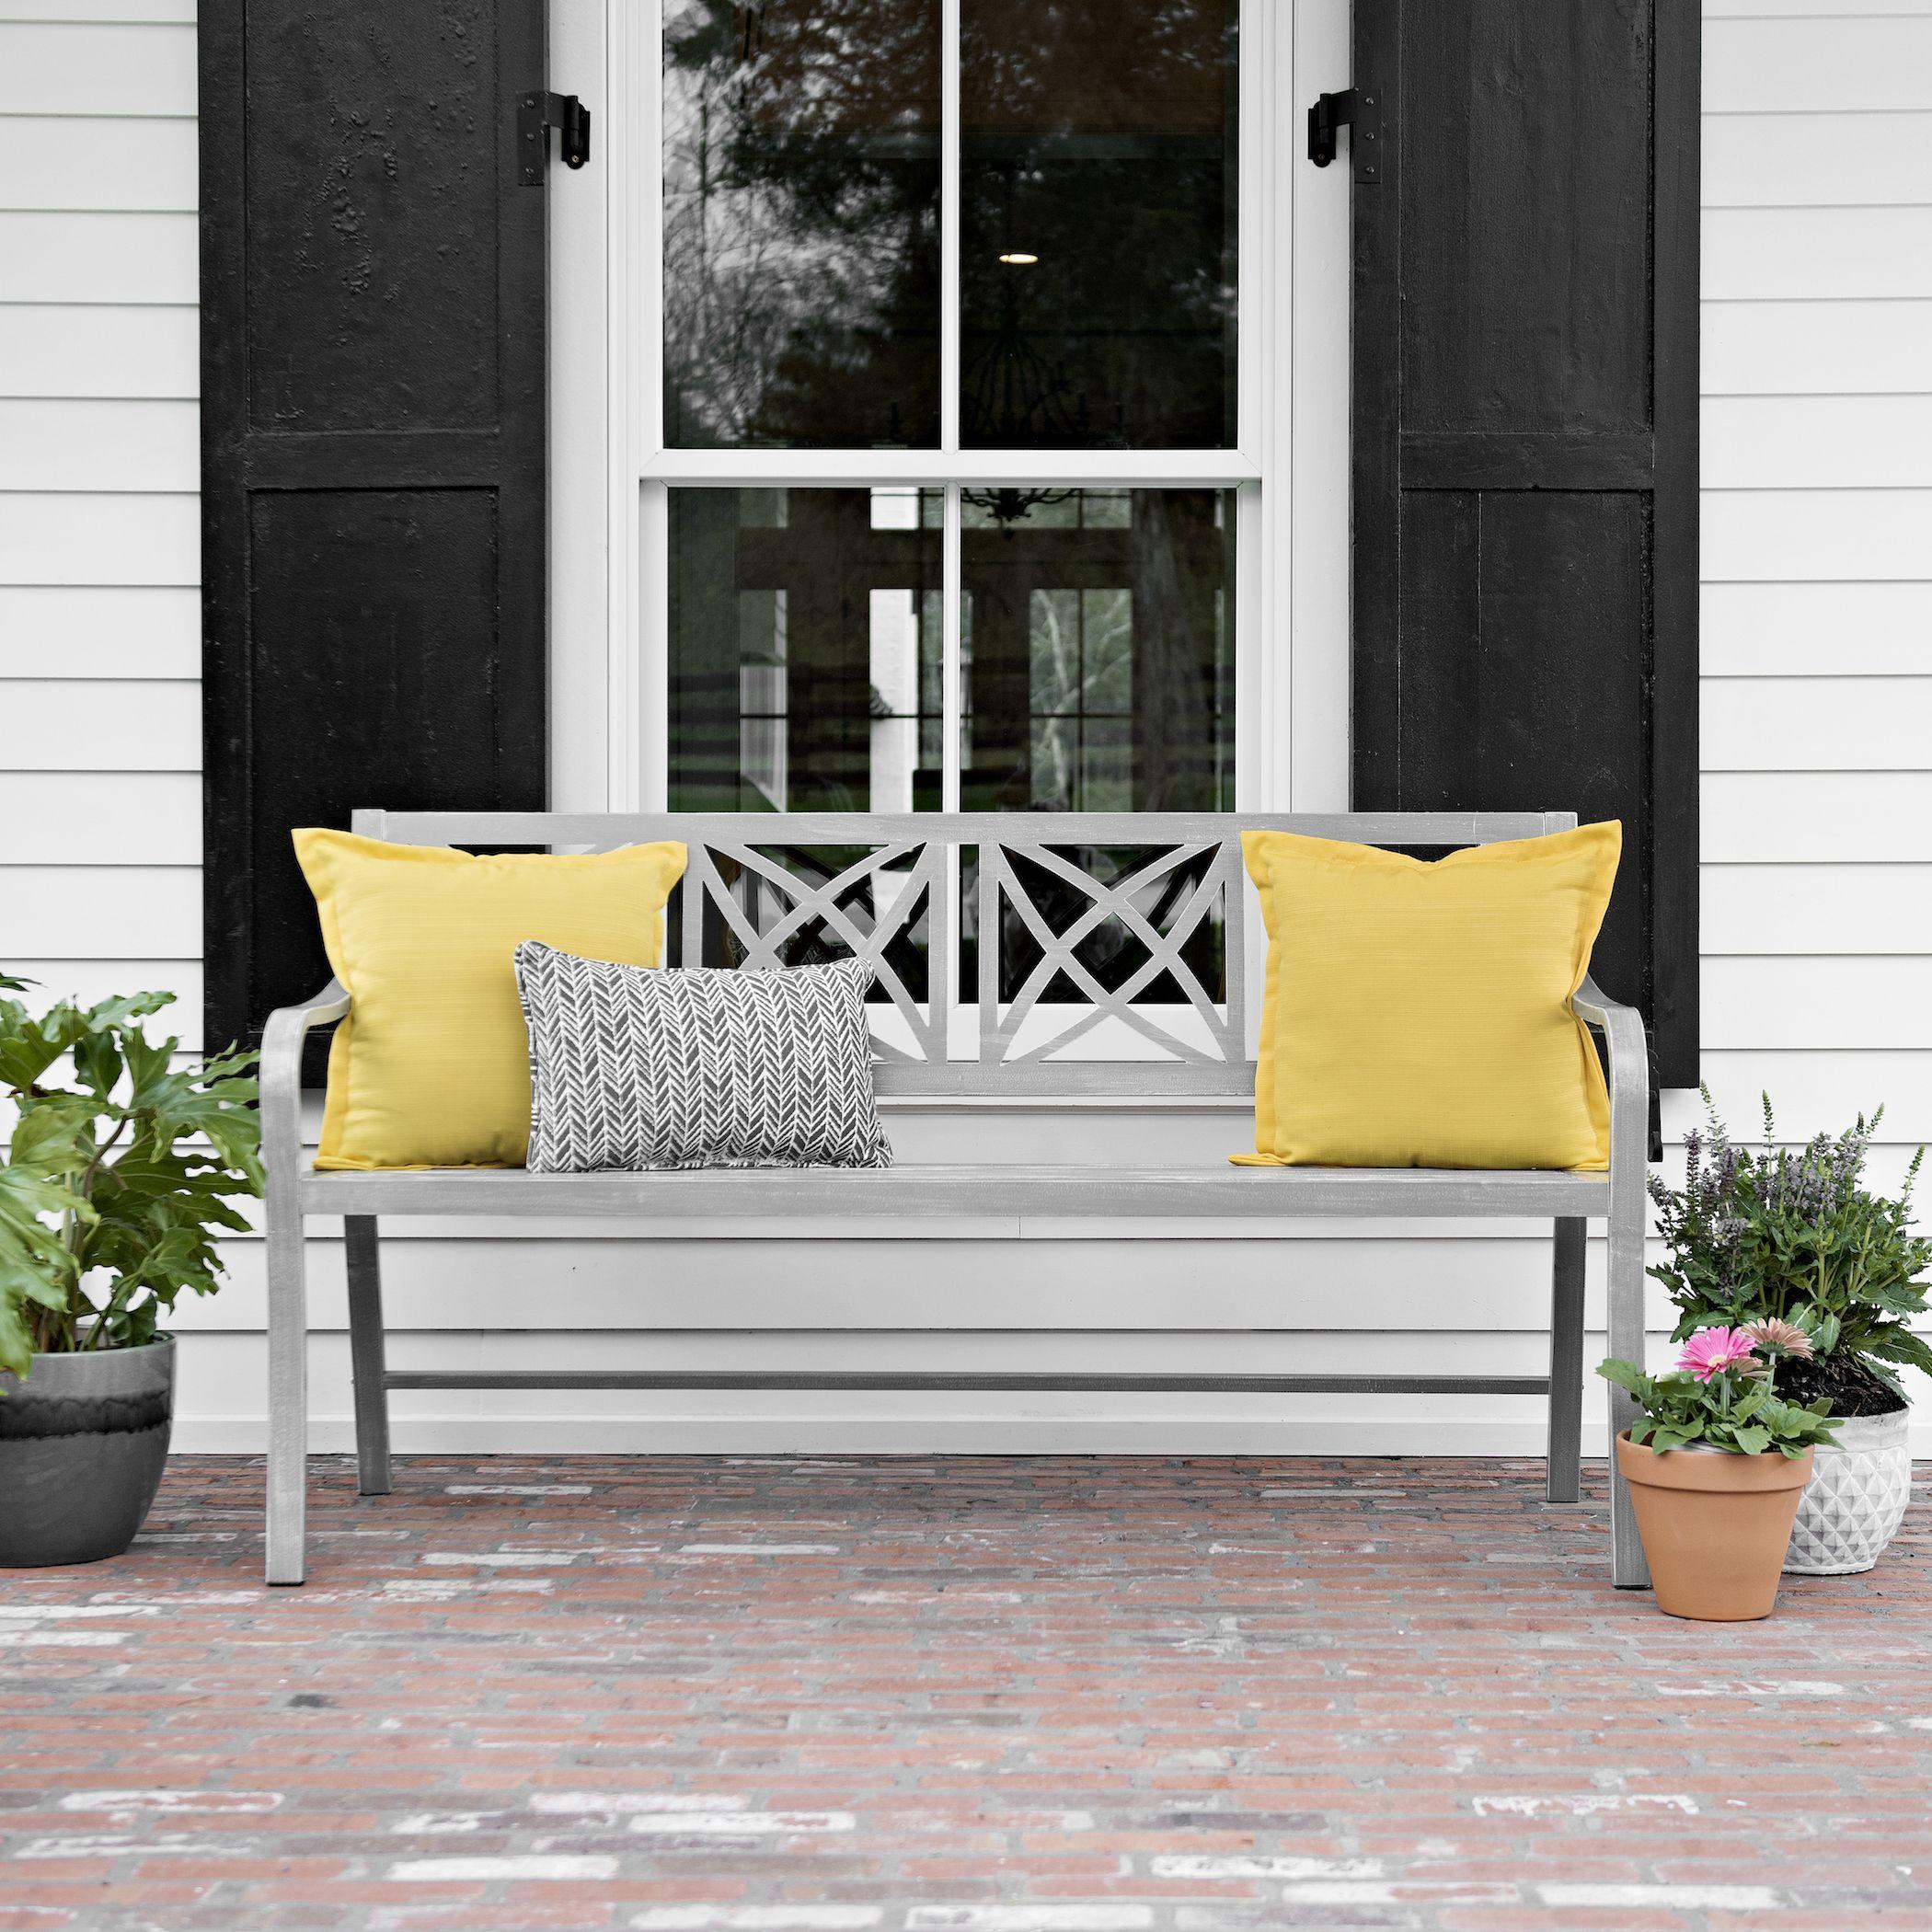 product details creamy gray geometric bench home decor metal rh pinterest com